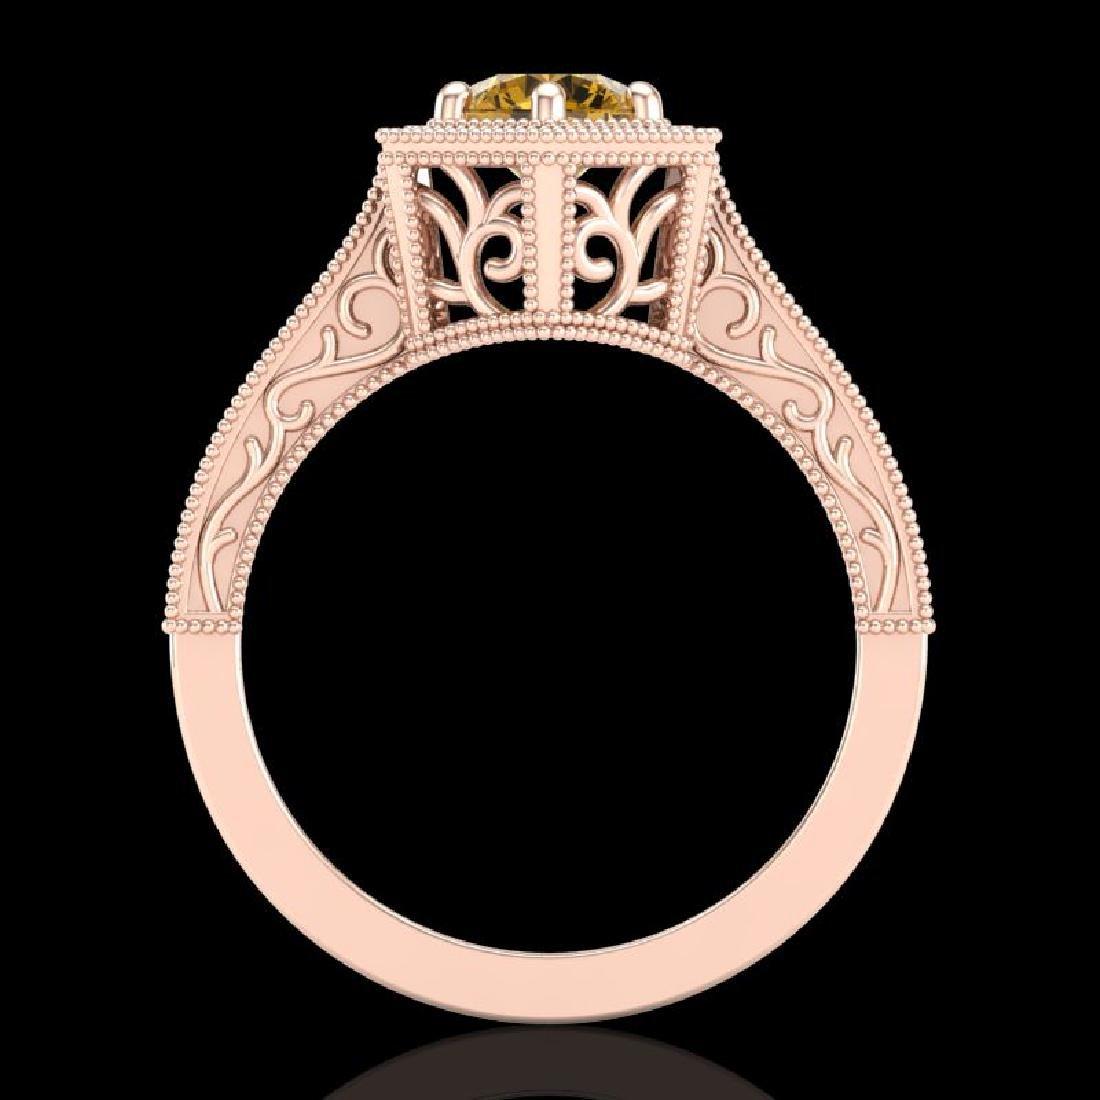 0.77 CTW Intense Fancy Yellow Diamond Engagement Art - 2